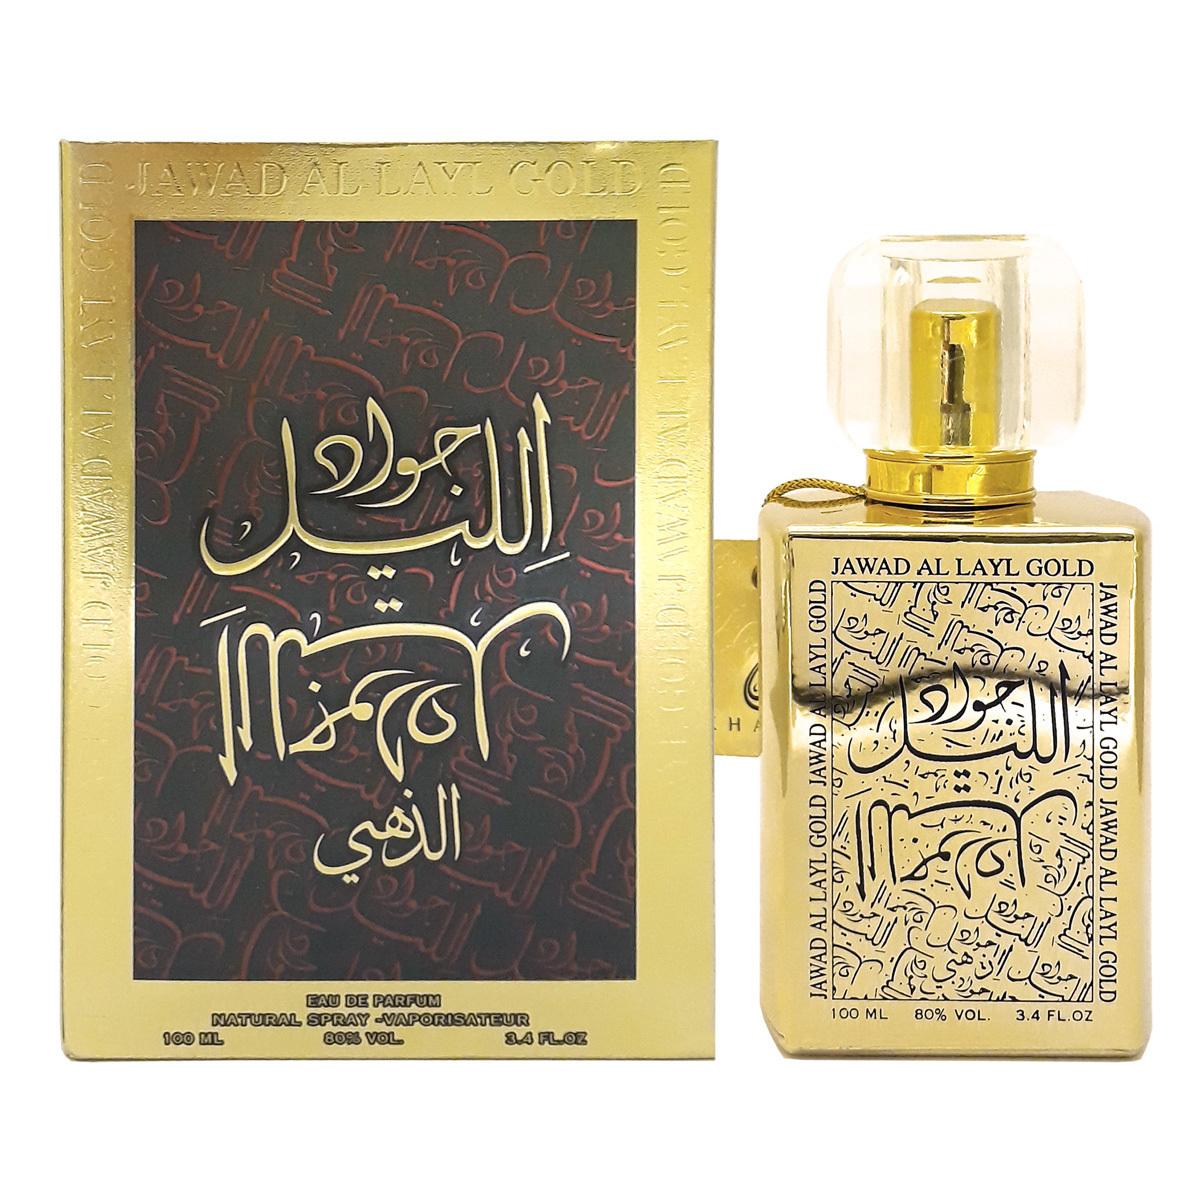 Пробник для Jawad al Layl Gold  Джавад аль Лайл Золото 1 мл спрей от Халис Khalis Perfumes